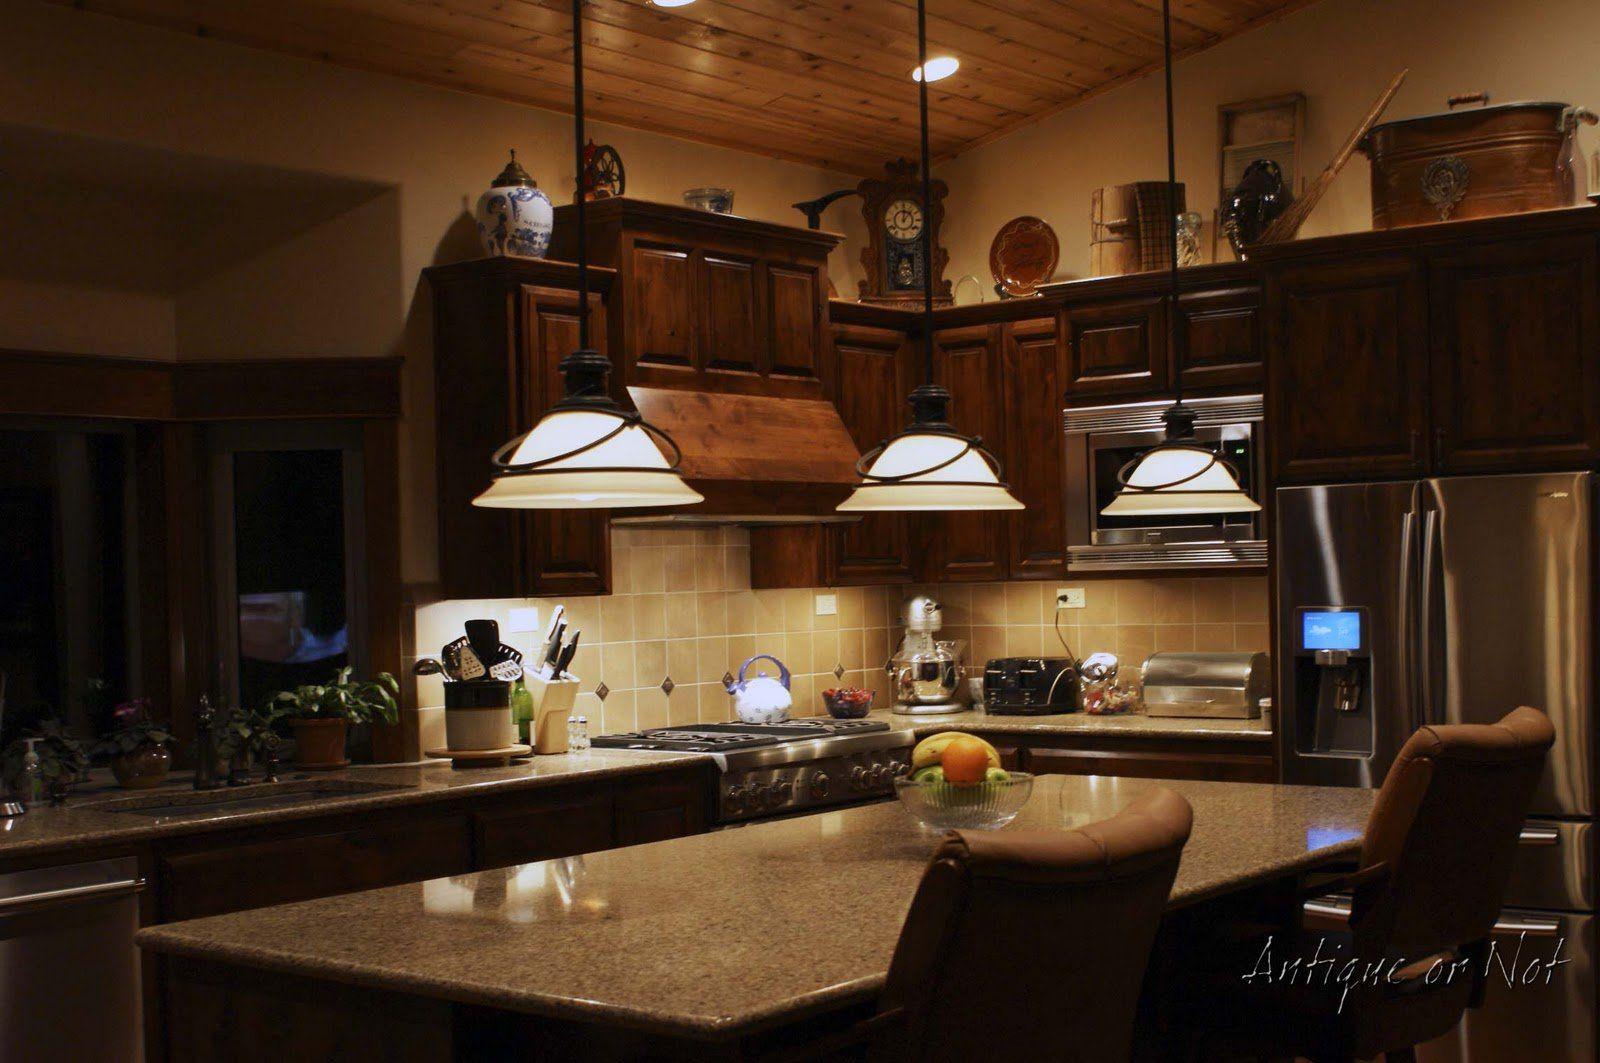 Modern Small Kitchen Design Cool Kitchens Decor Idea  Http Glamorous Cool Kitchen Designs 2018